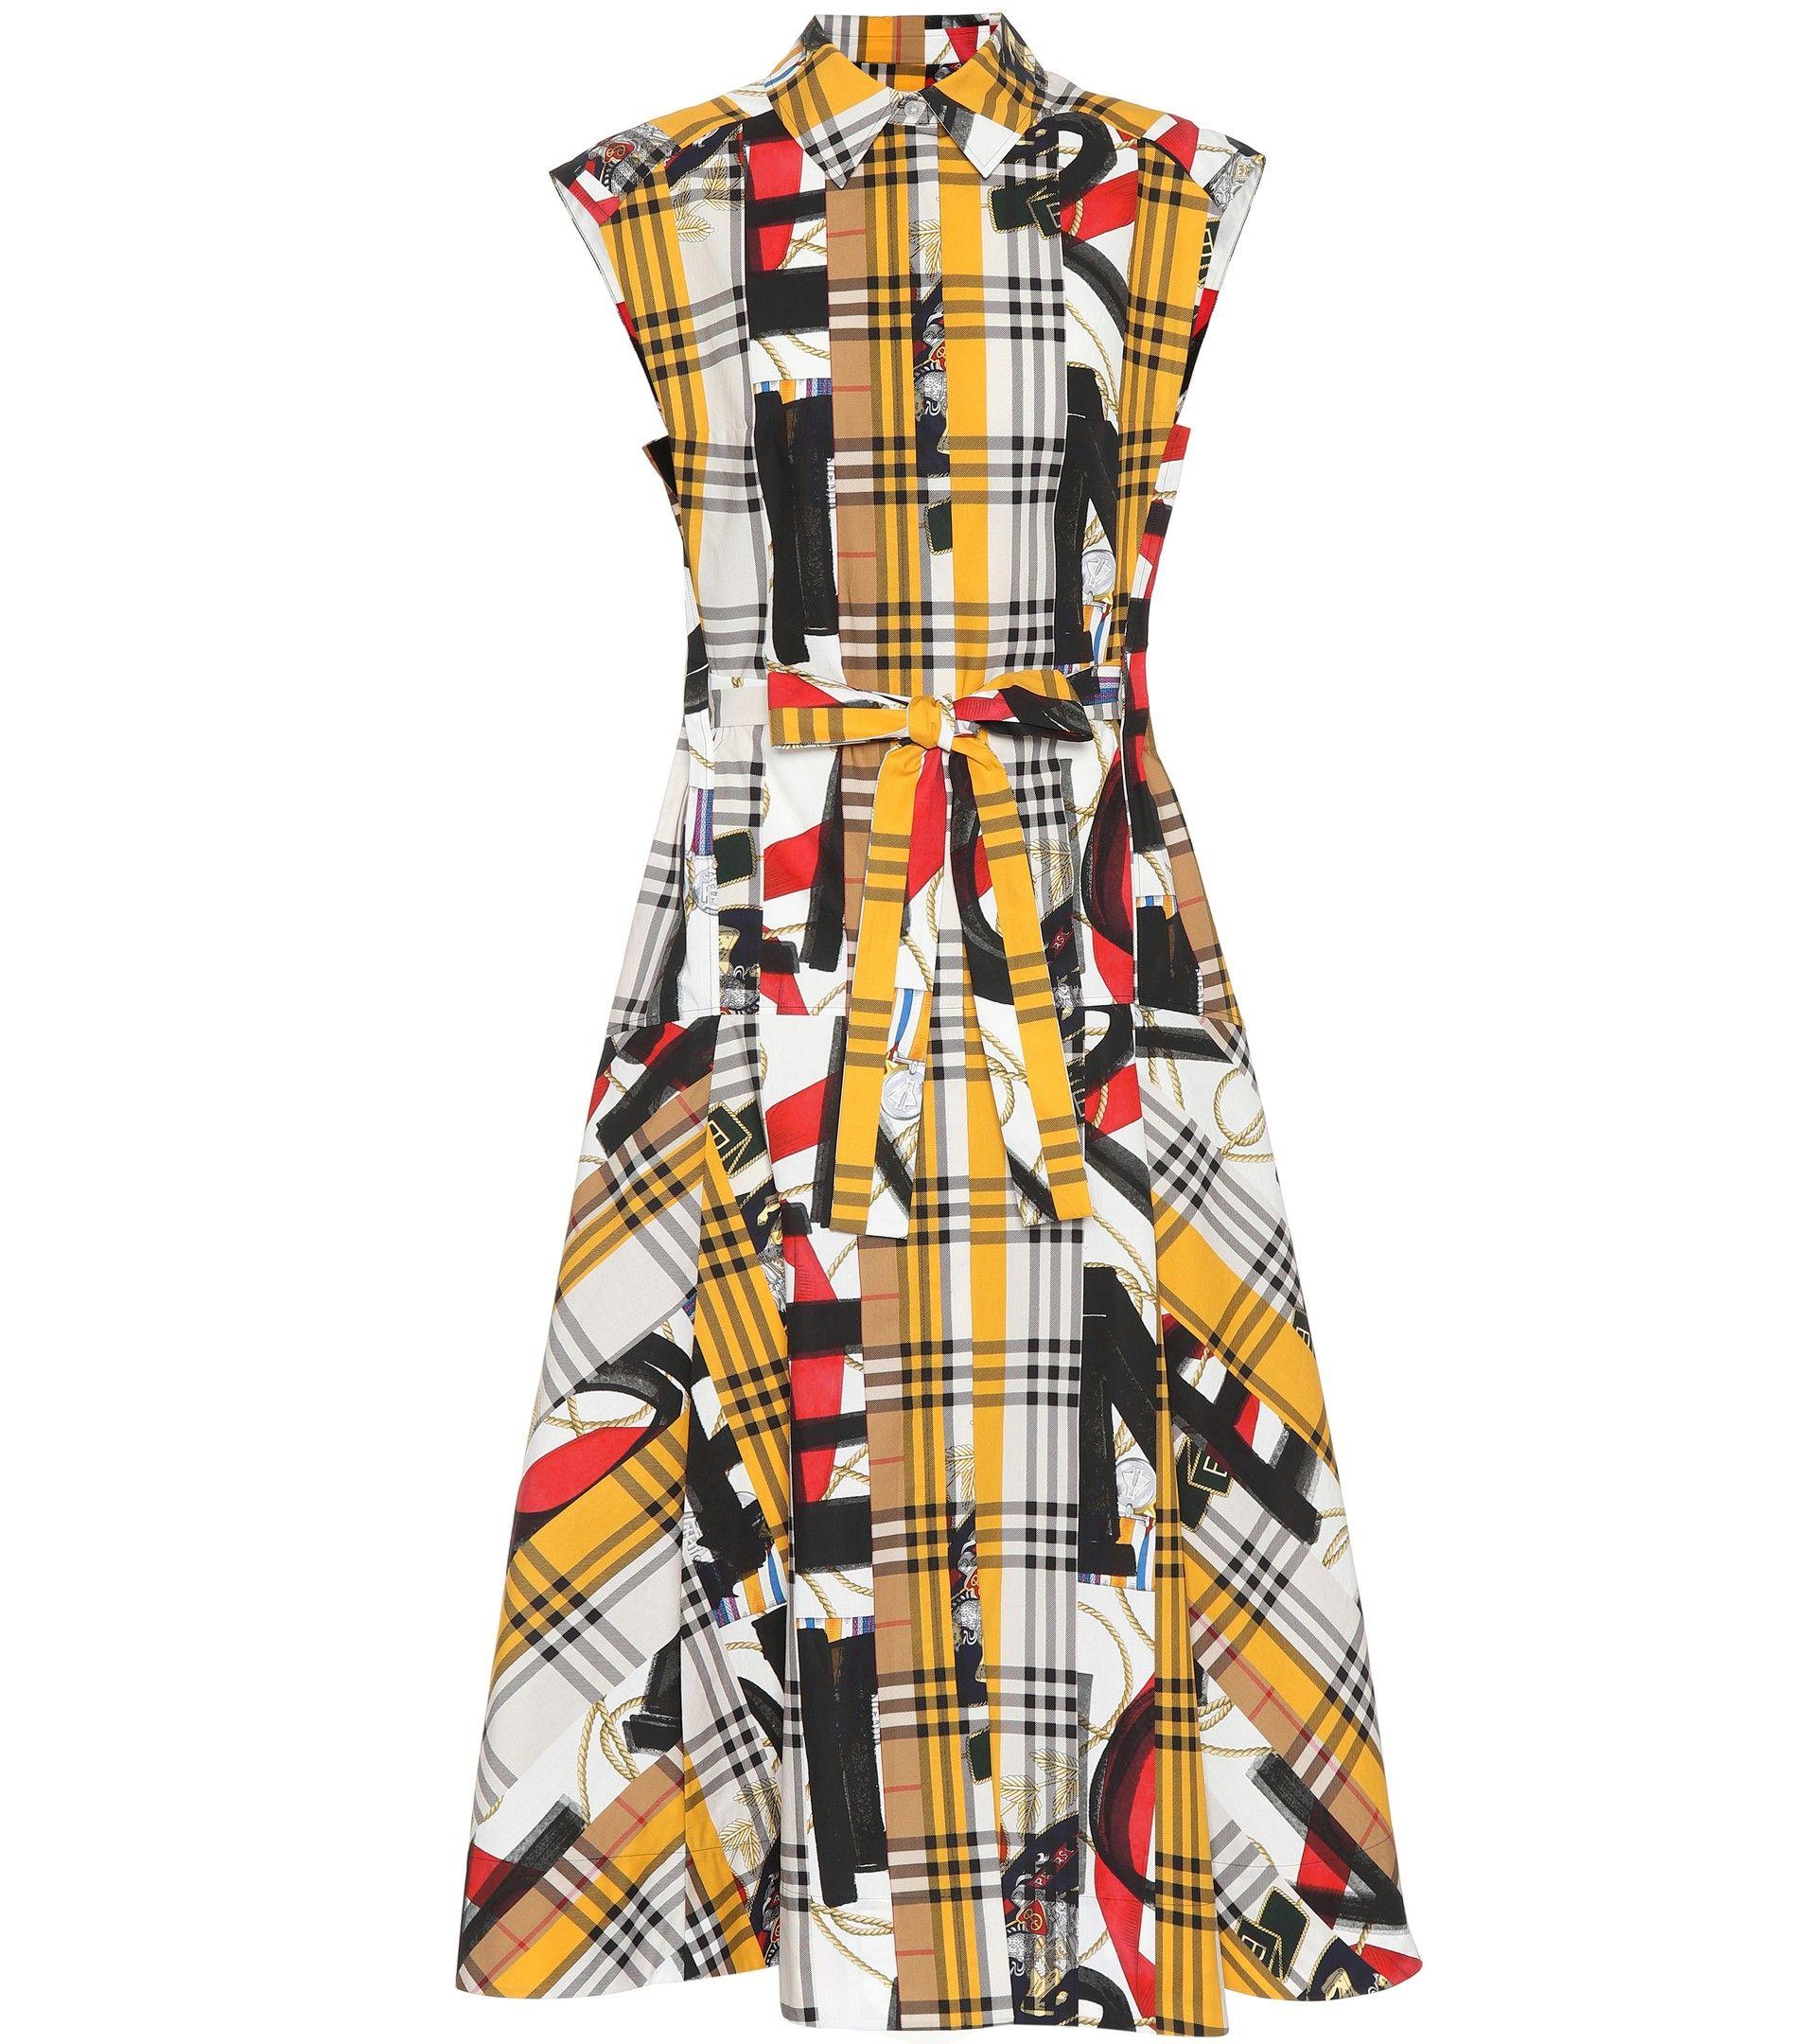 961e81ccfda0 Burberry - Archive Scarf print cotton dress | mytheresa.com | Mode ...